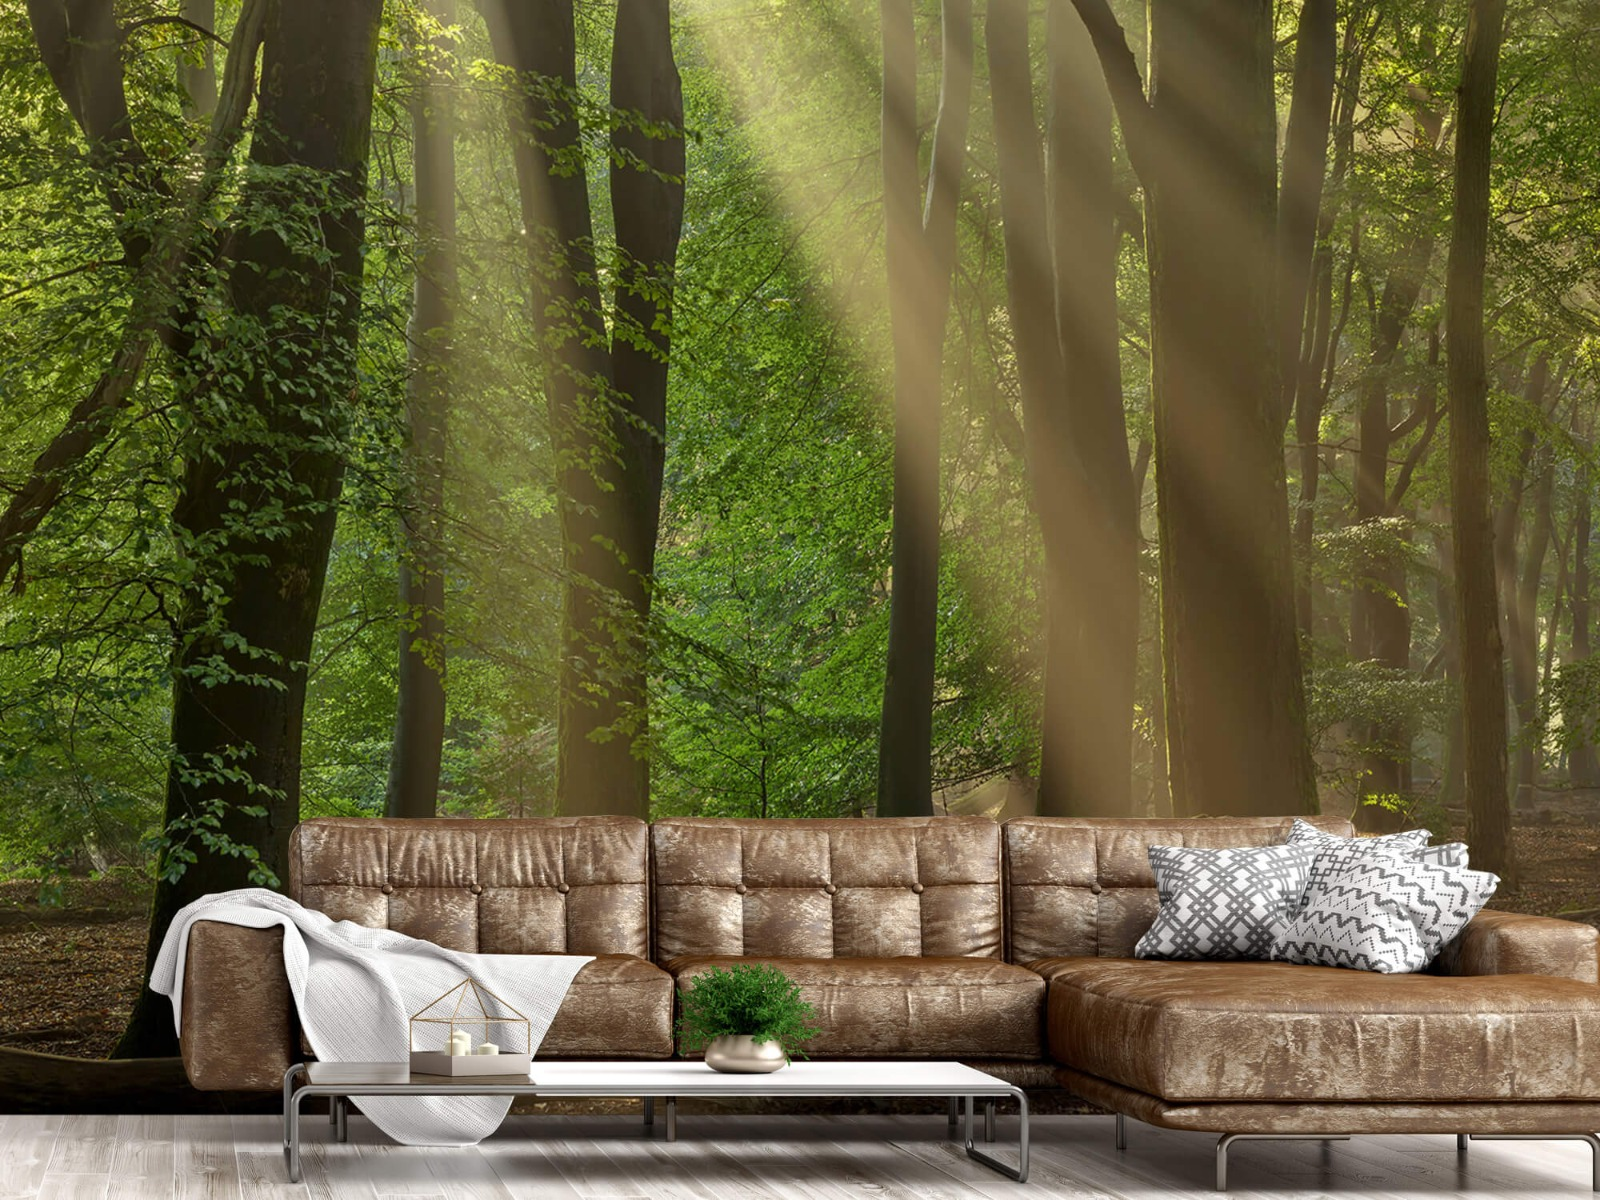 Bomen - Zonneharpen in het bos - Slaapkamer 15